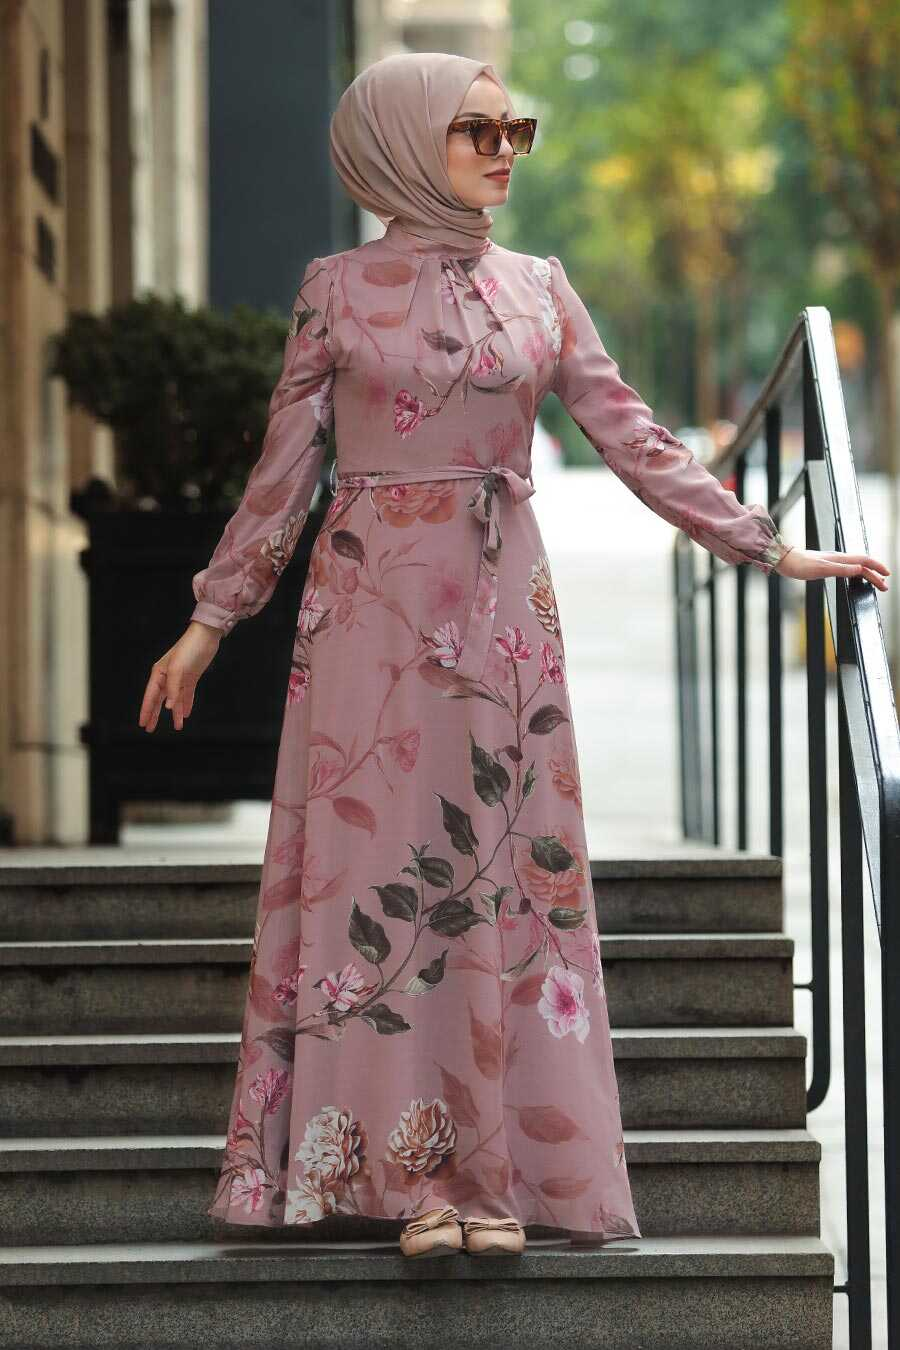 Powder Pink Hijab Daily Dress 8154PD